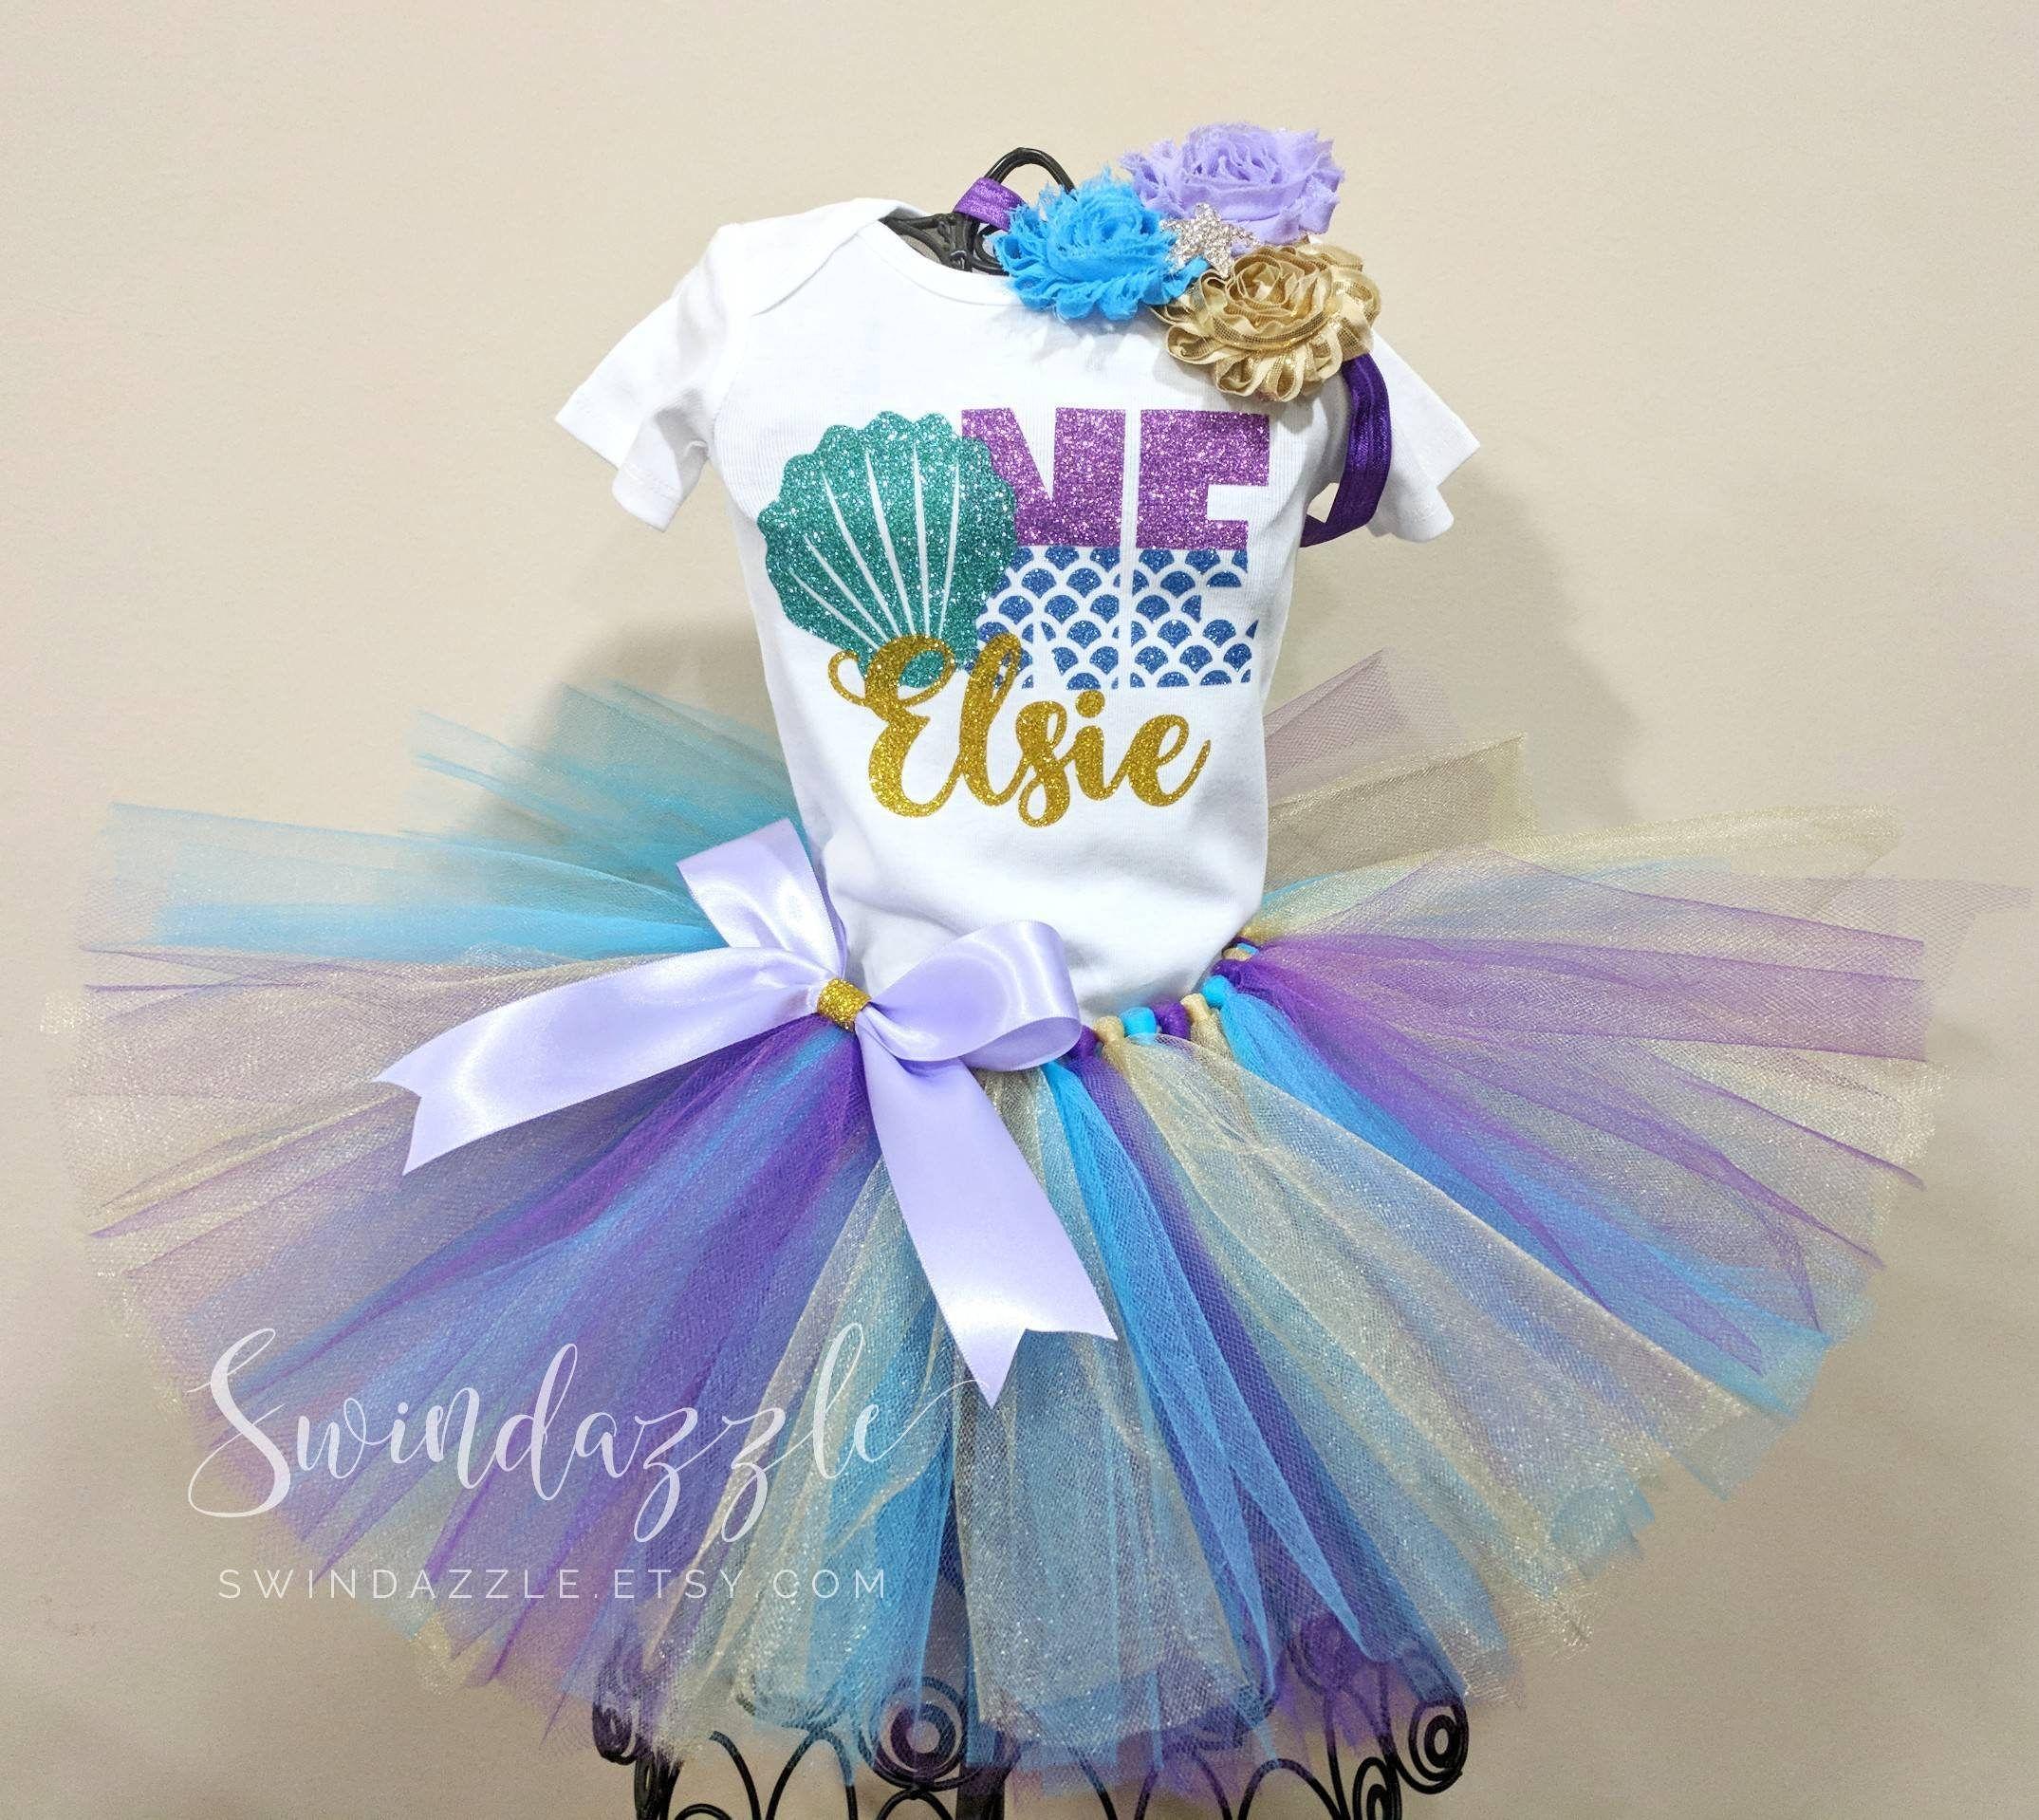 37e1ab7b9be15 Mermaid first birthday tutu outfit - mermaid theme birthday - mermaid  birthday shirt - purple and blue mermaid - first birthday girl -mermom by  Swindazzle ...